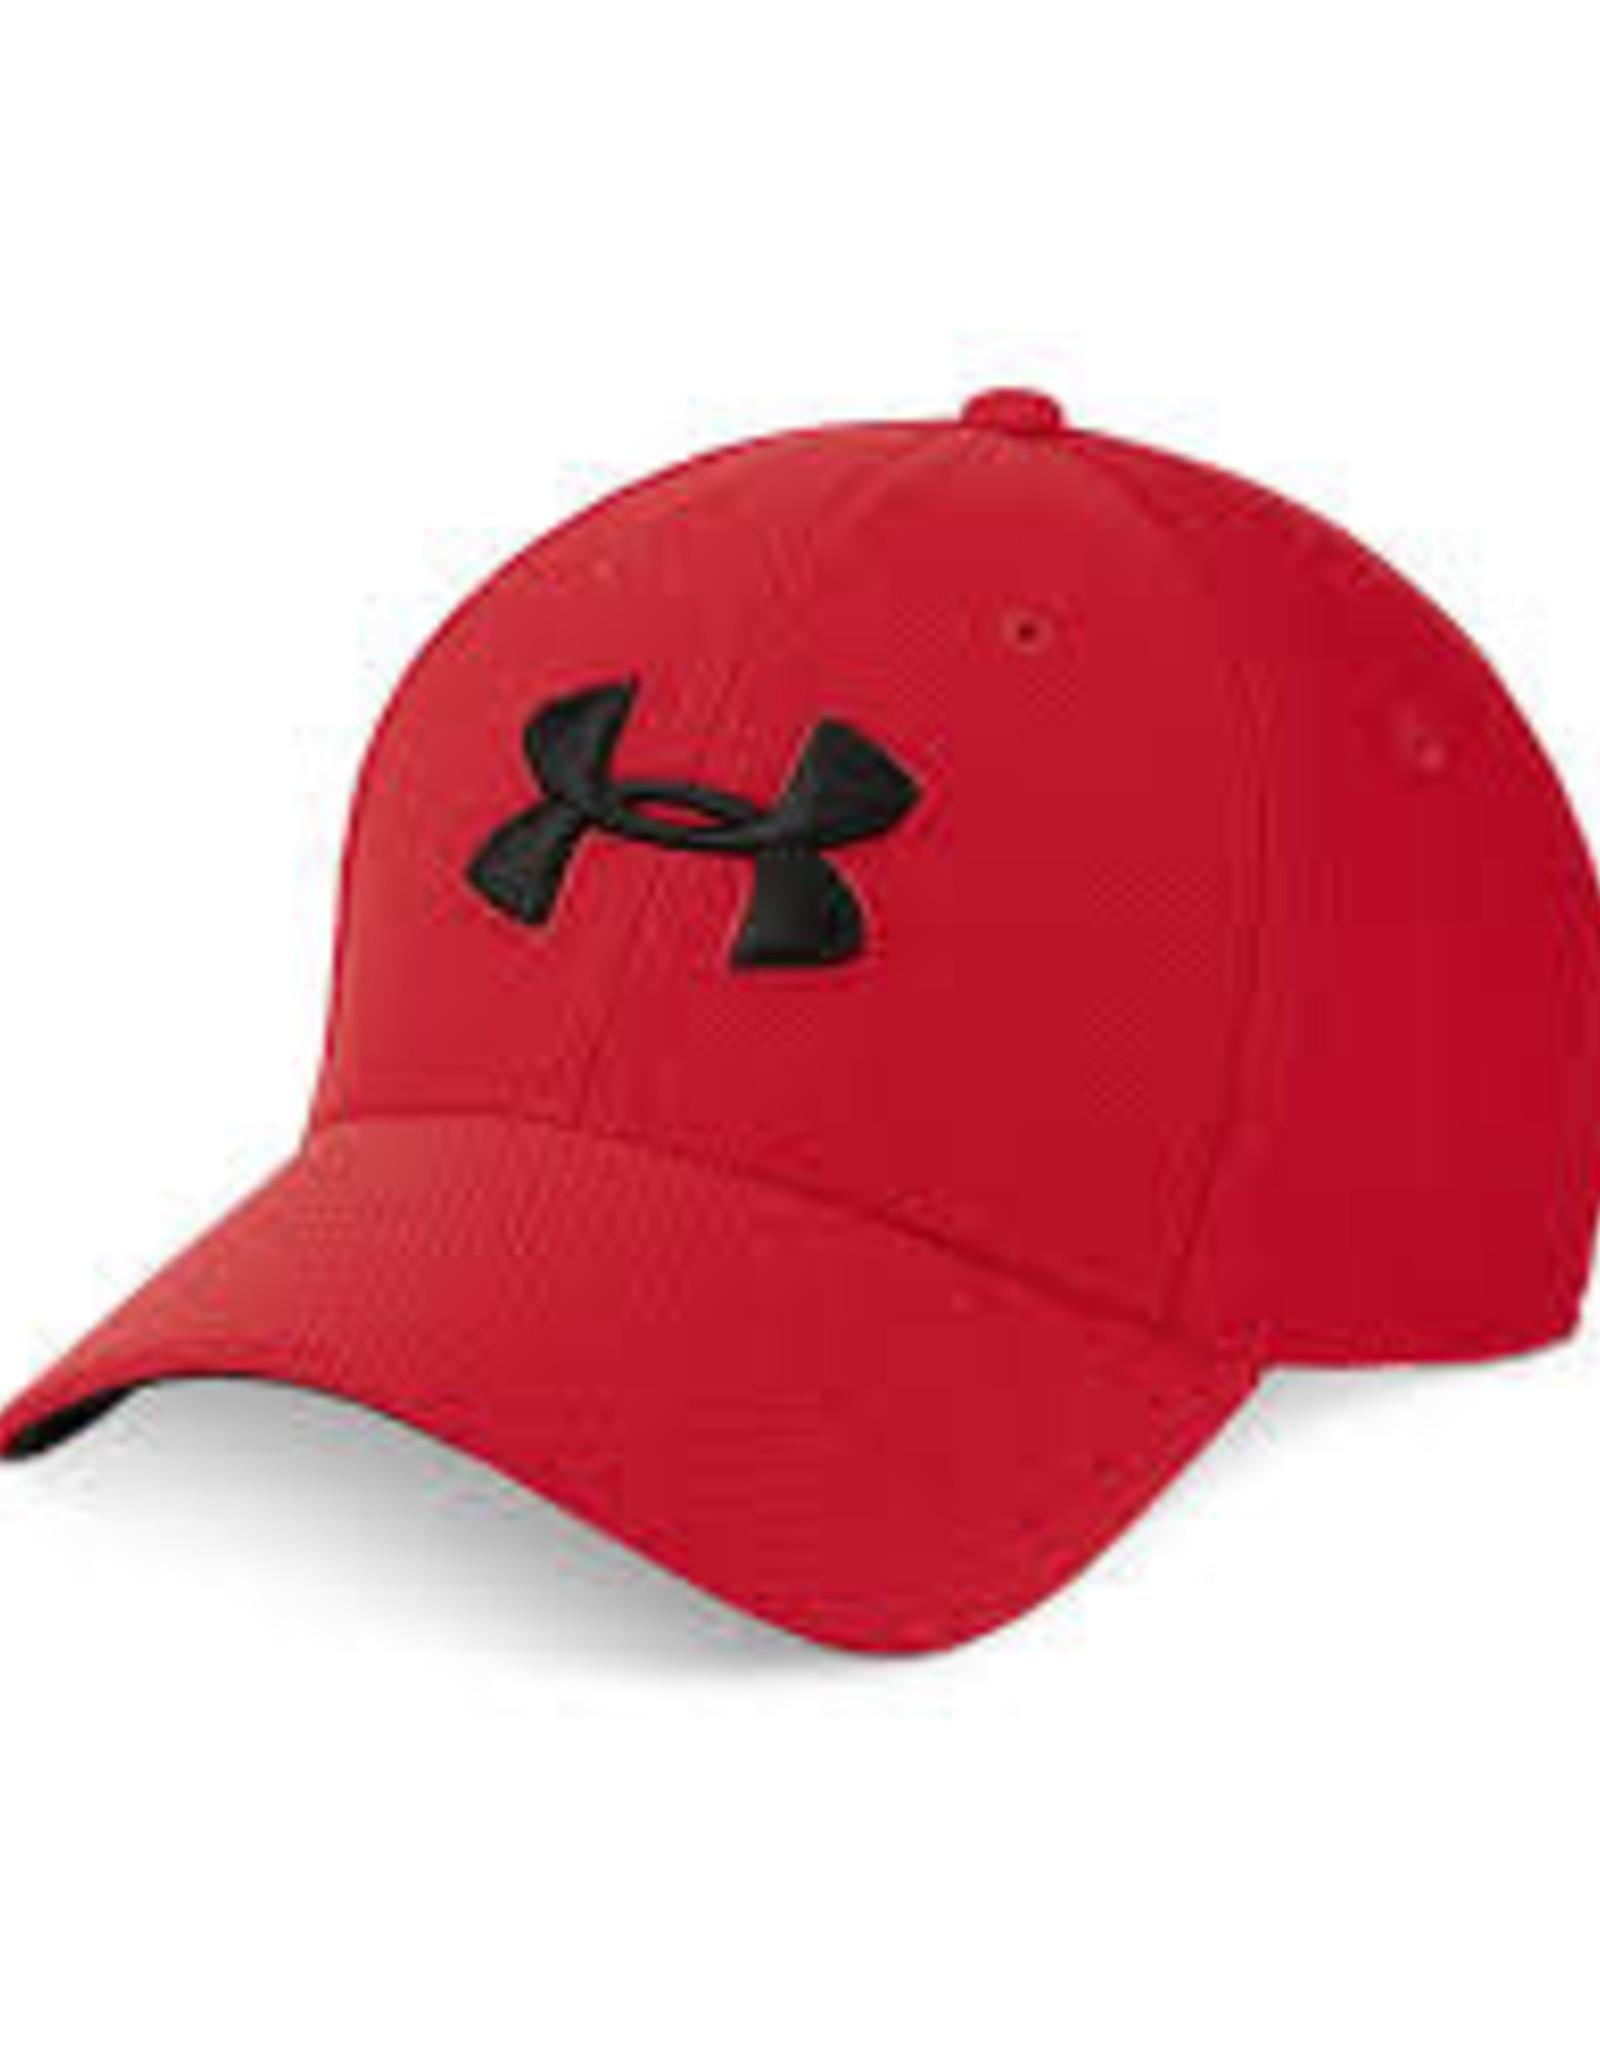 Under Armour Mens UA Men's Blitzing 3.0 Cap Red / Red / Black L/XL